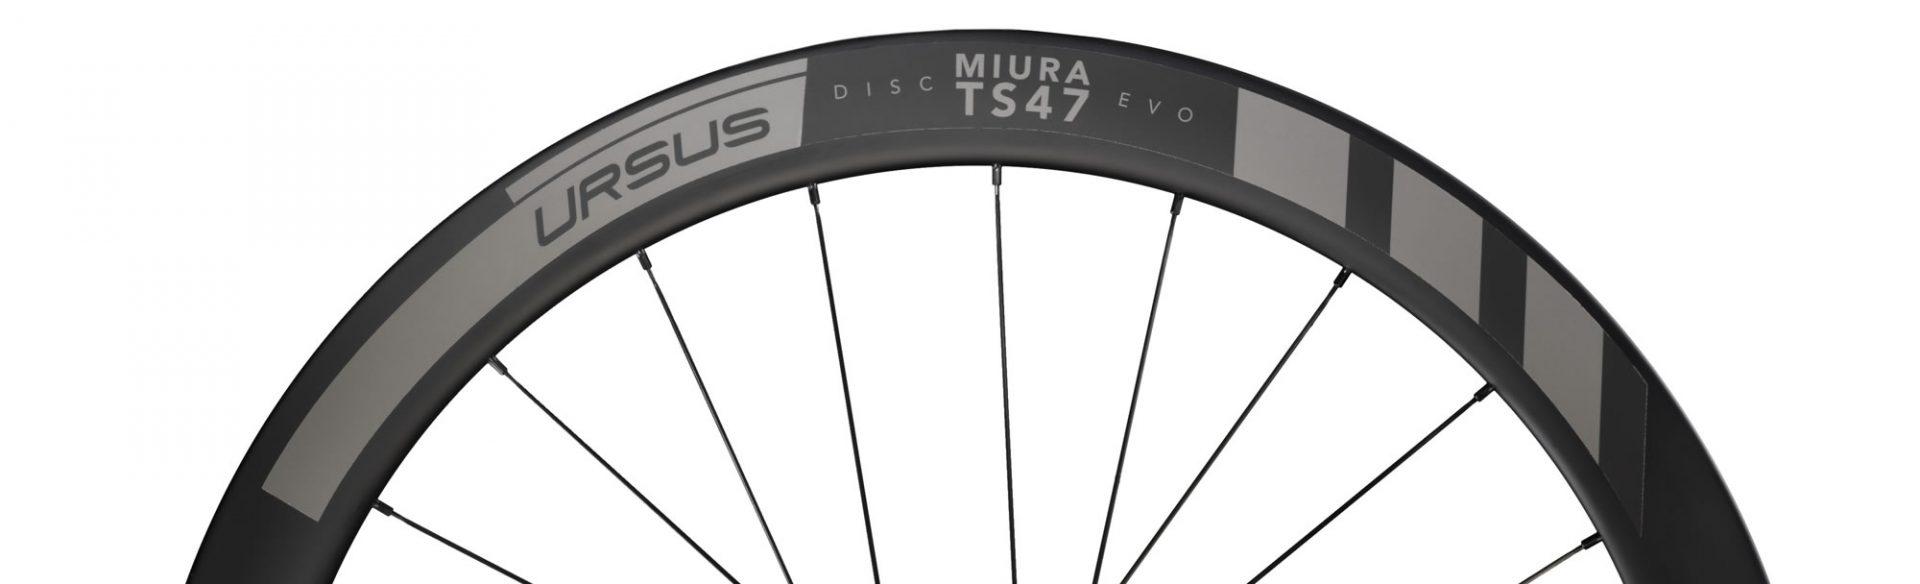 Miura TS47 EVO Disc